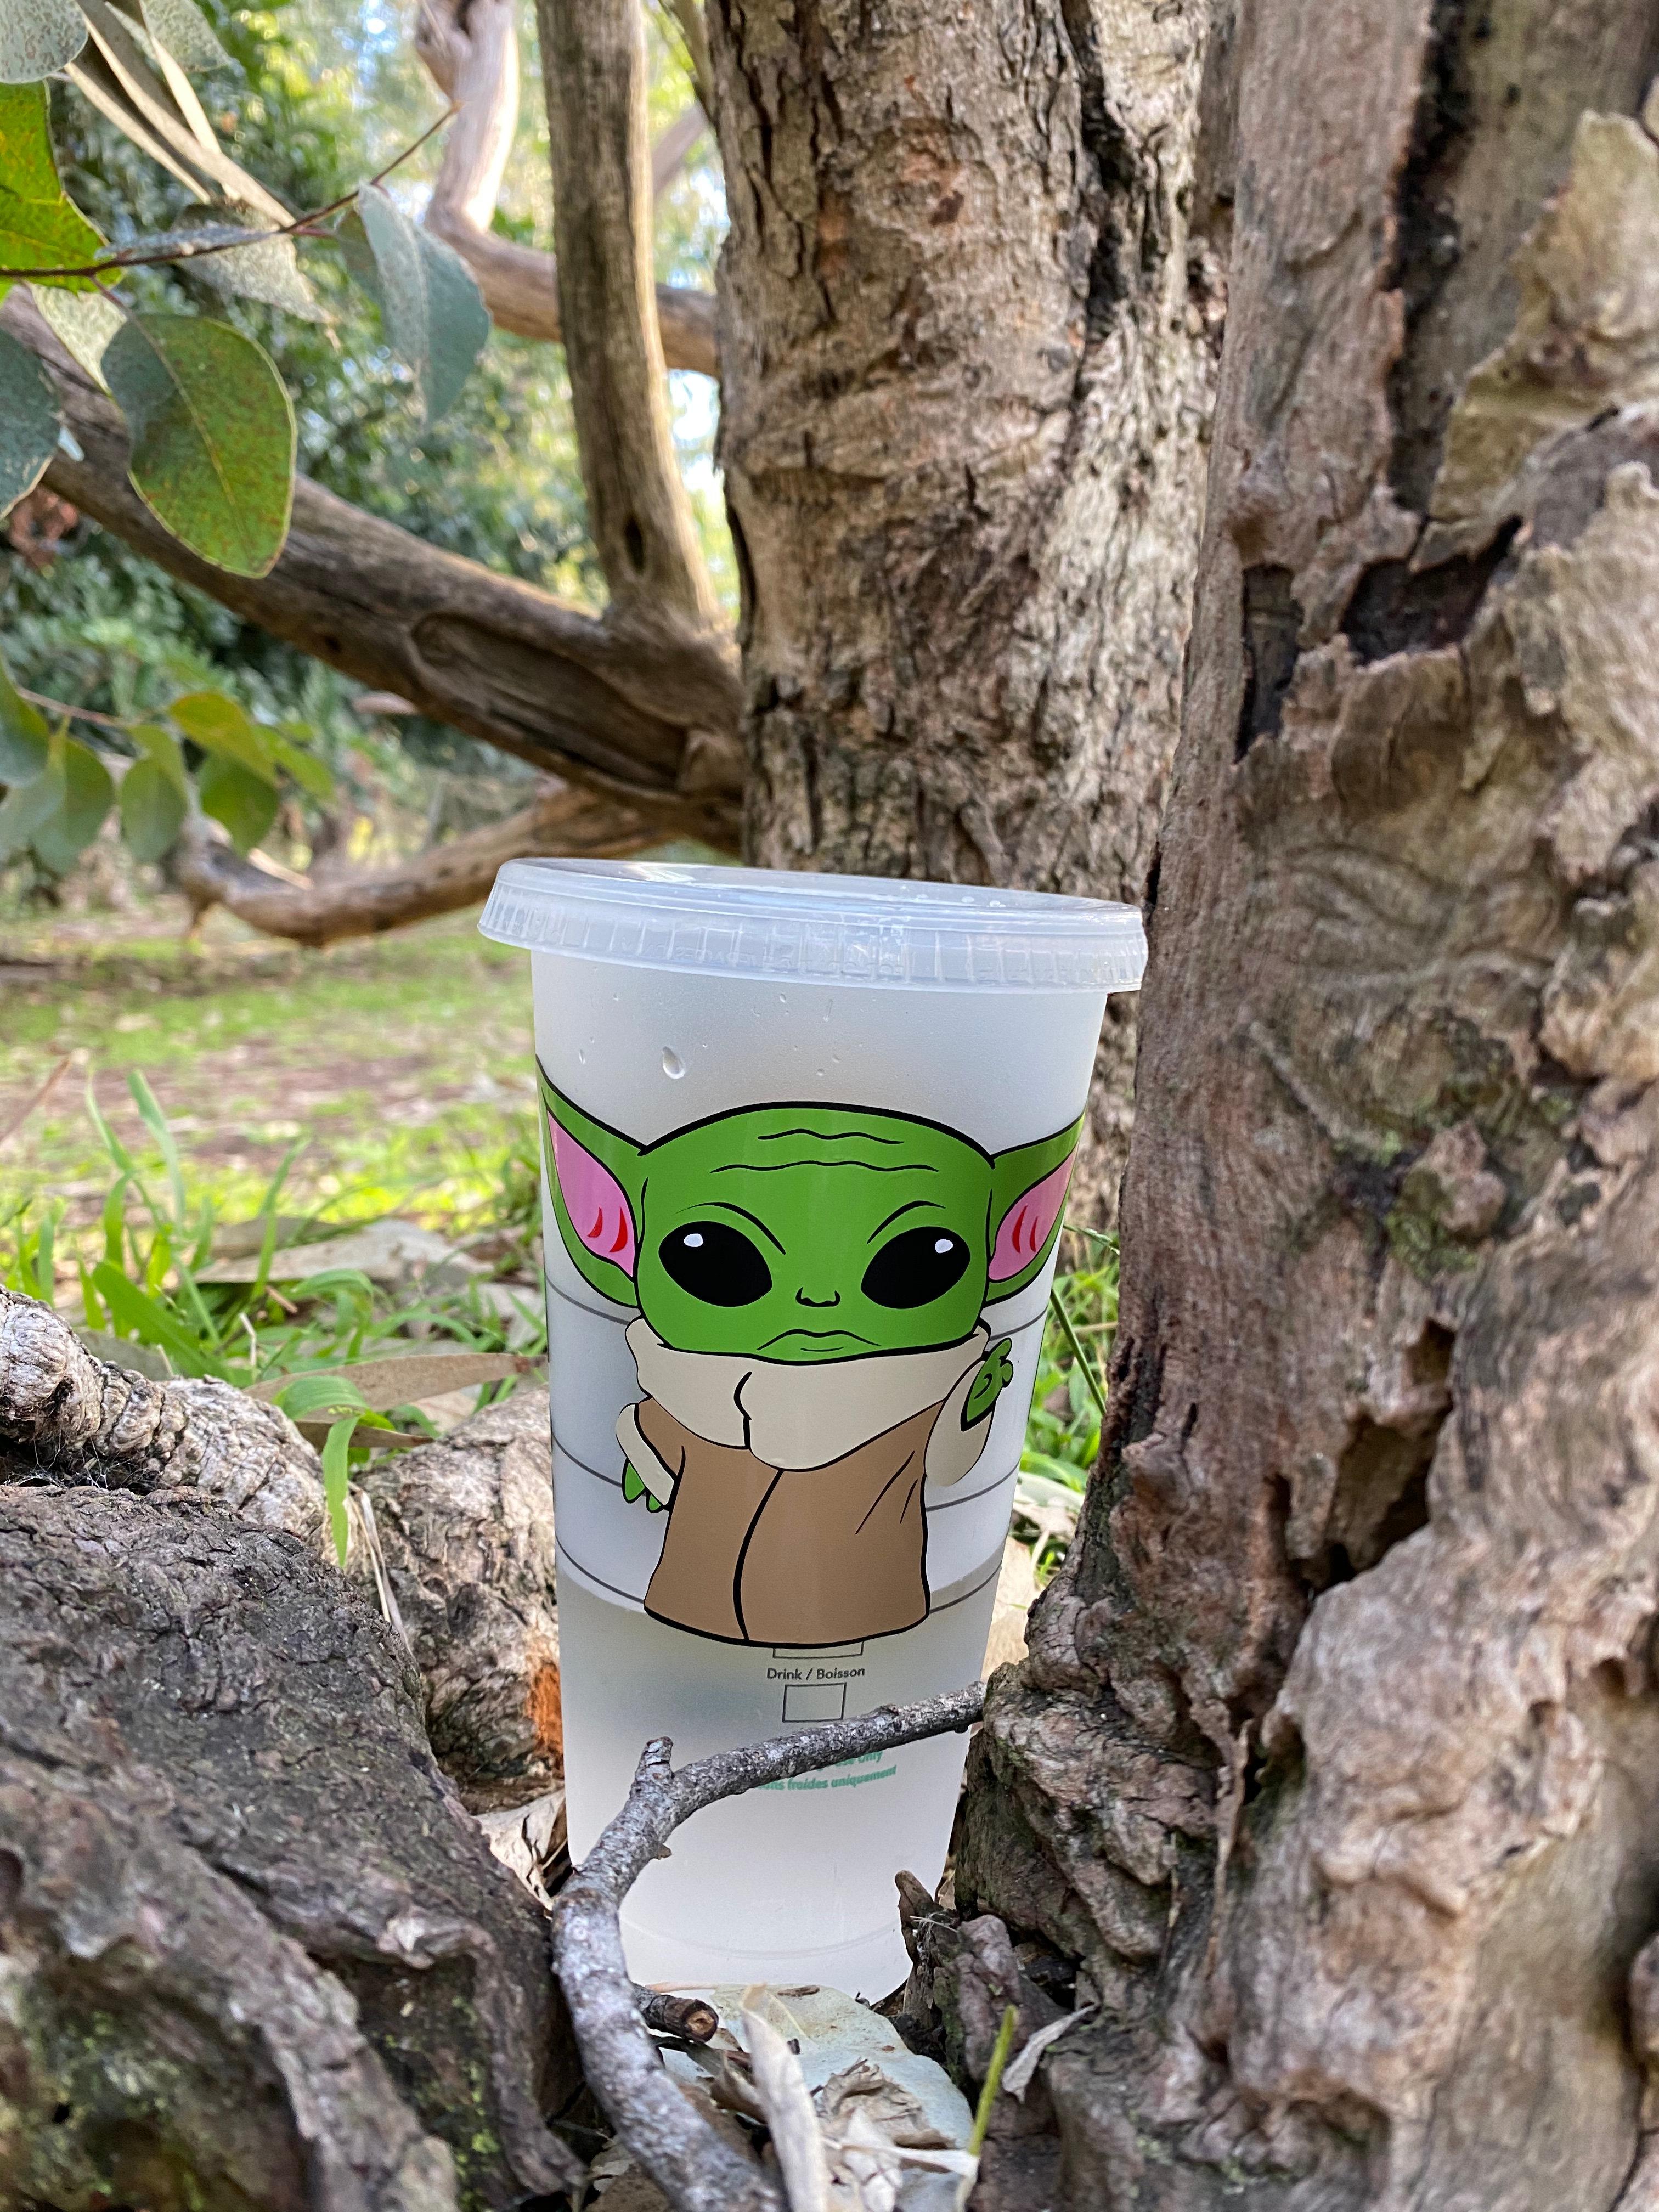 This Is The Way Mythosaur Star Wars: The Mandalorian Inspired Custom Starbucks Cold Cup -- Venti 24 oz